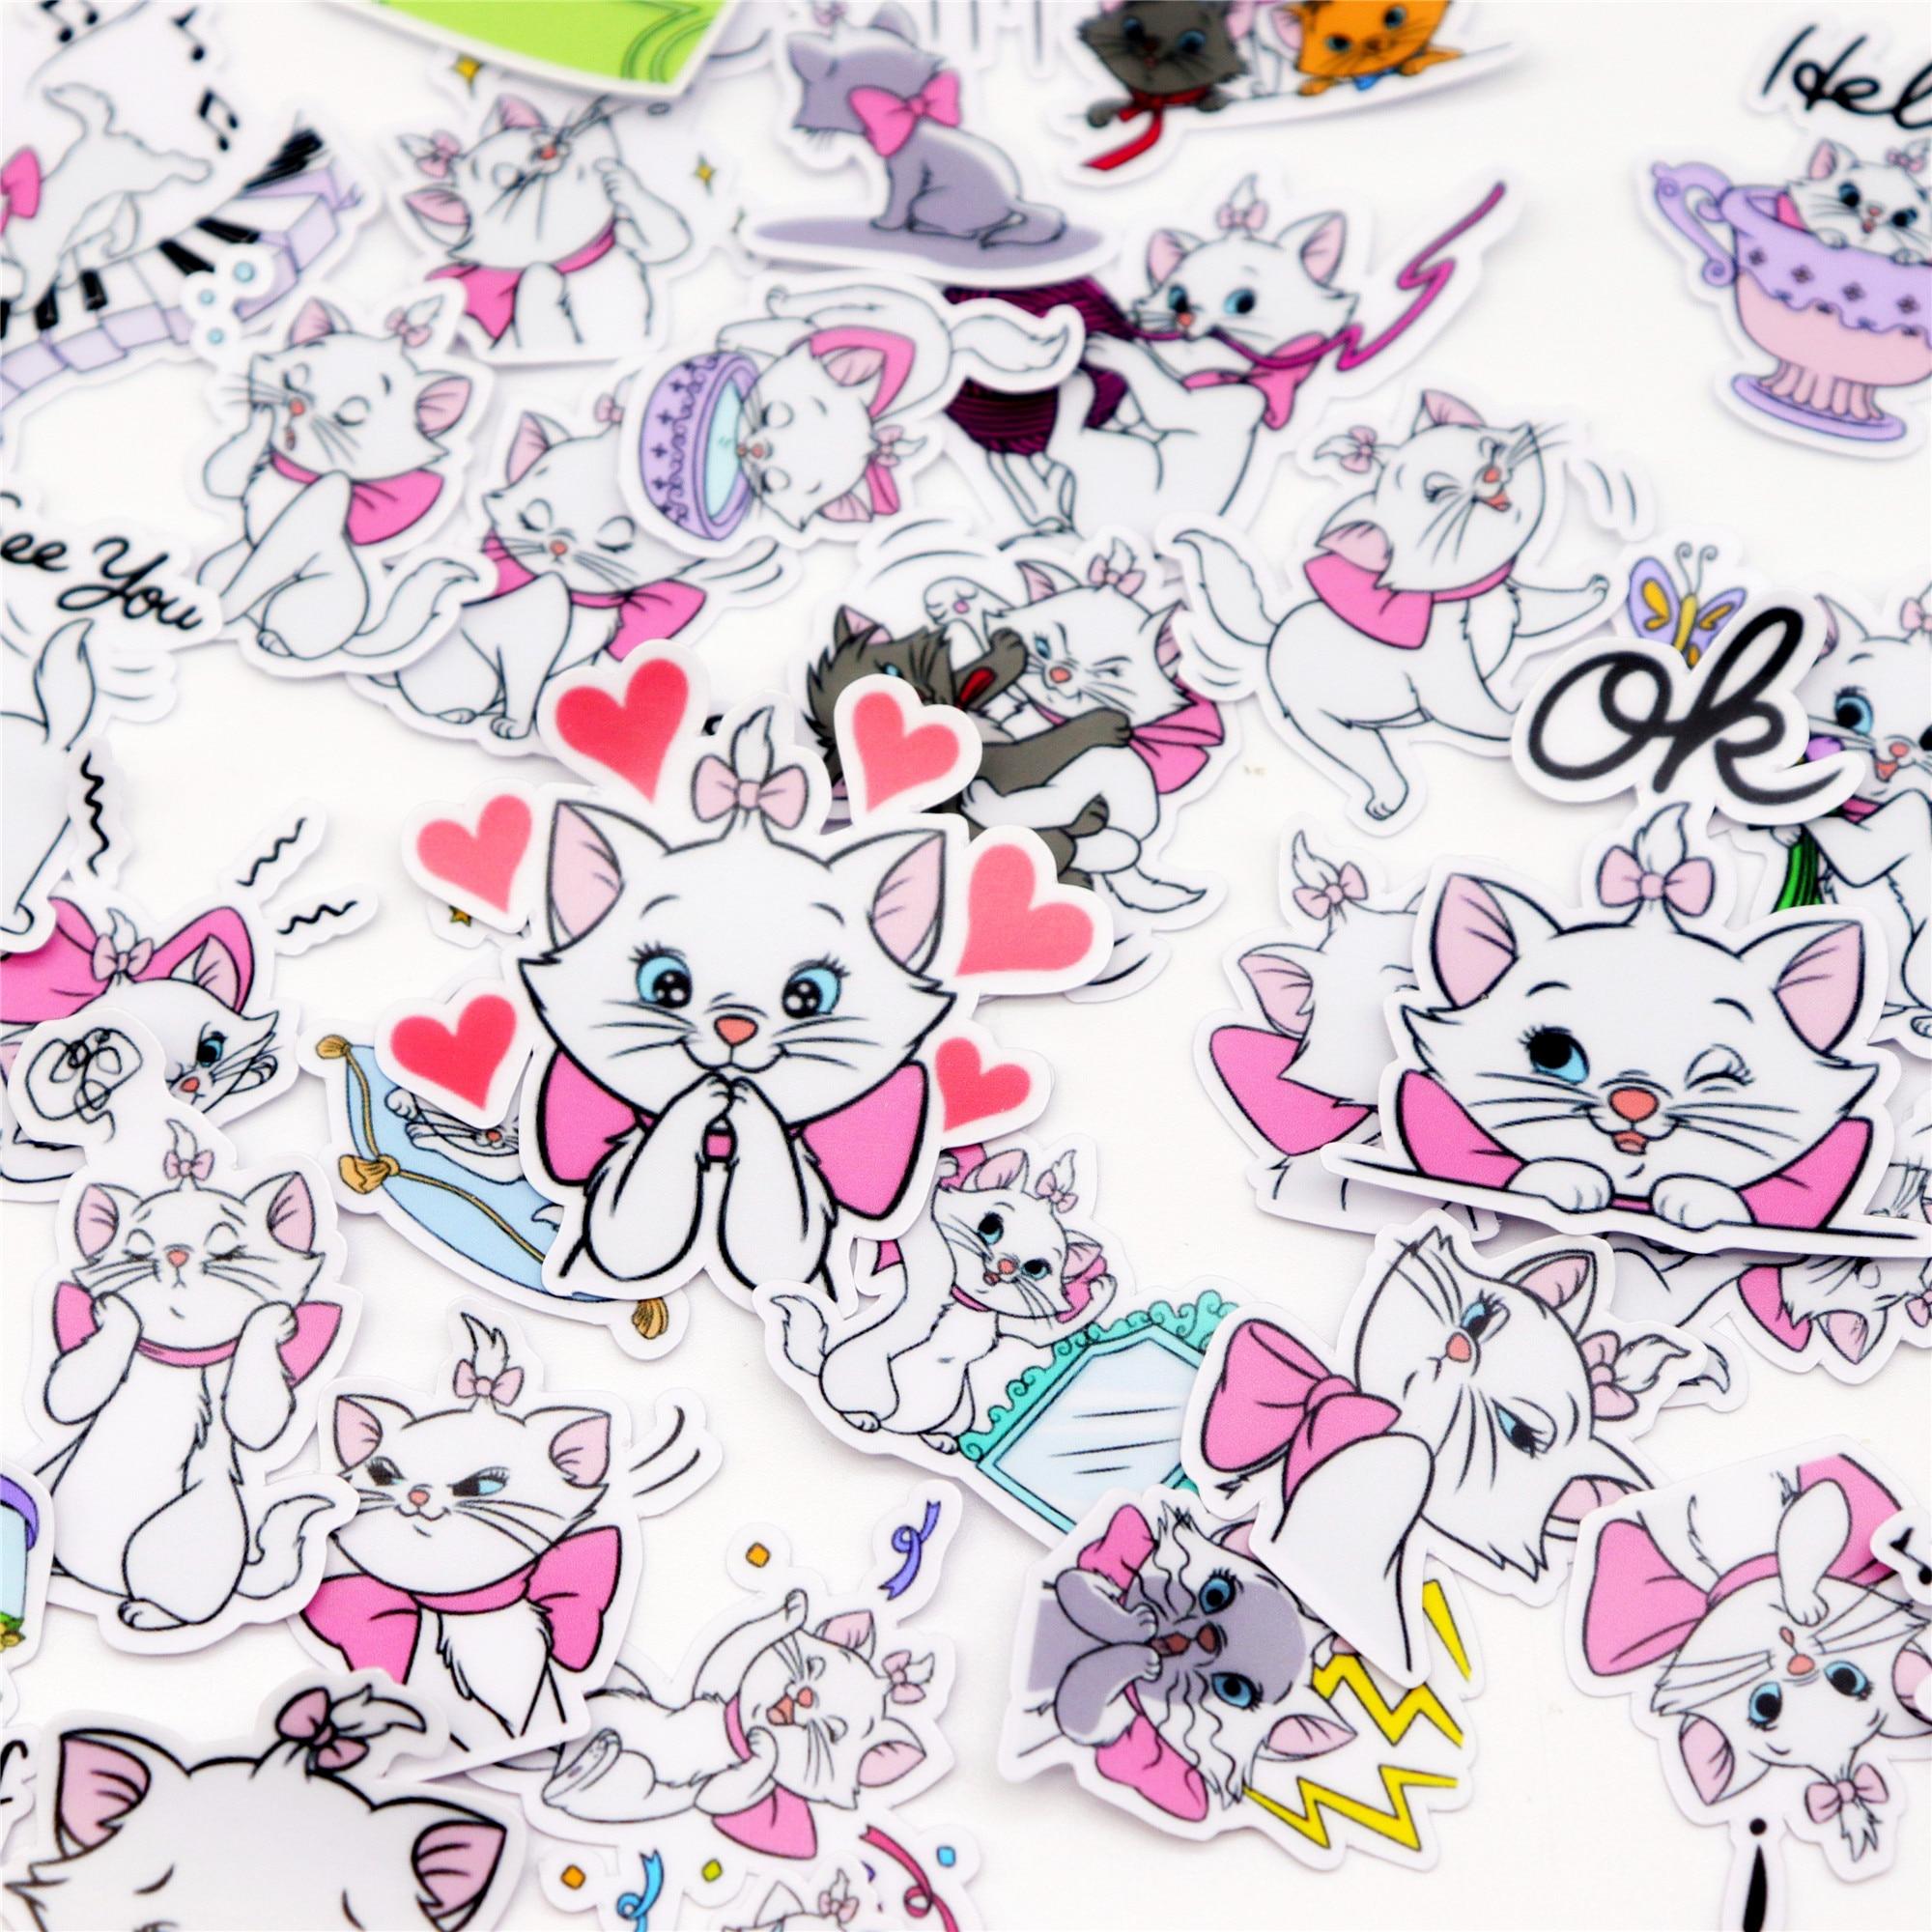 40pcs Creative Kawaii Self-made Cat Stickers/scrapbooking Stickers /decorative /DIY Photo Albums Waterproof/Notebook Diary